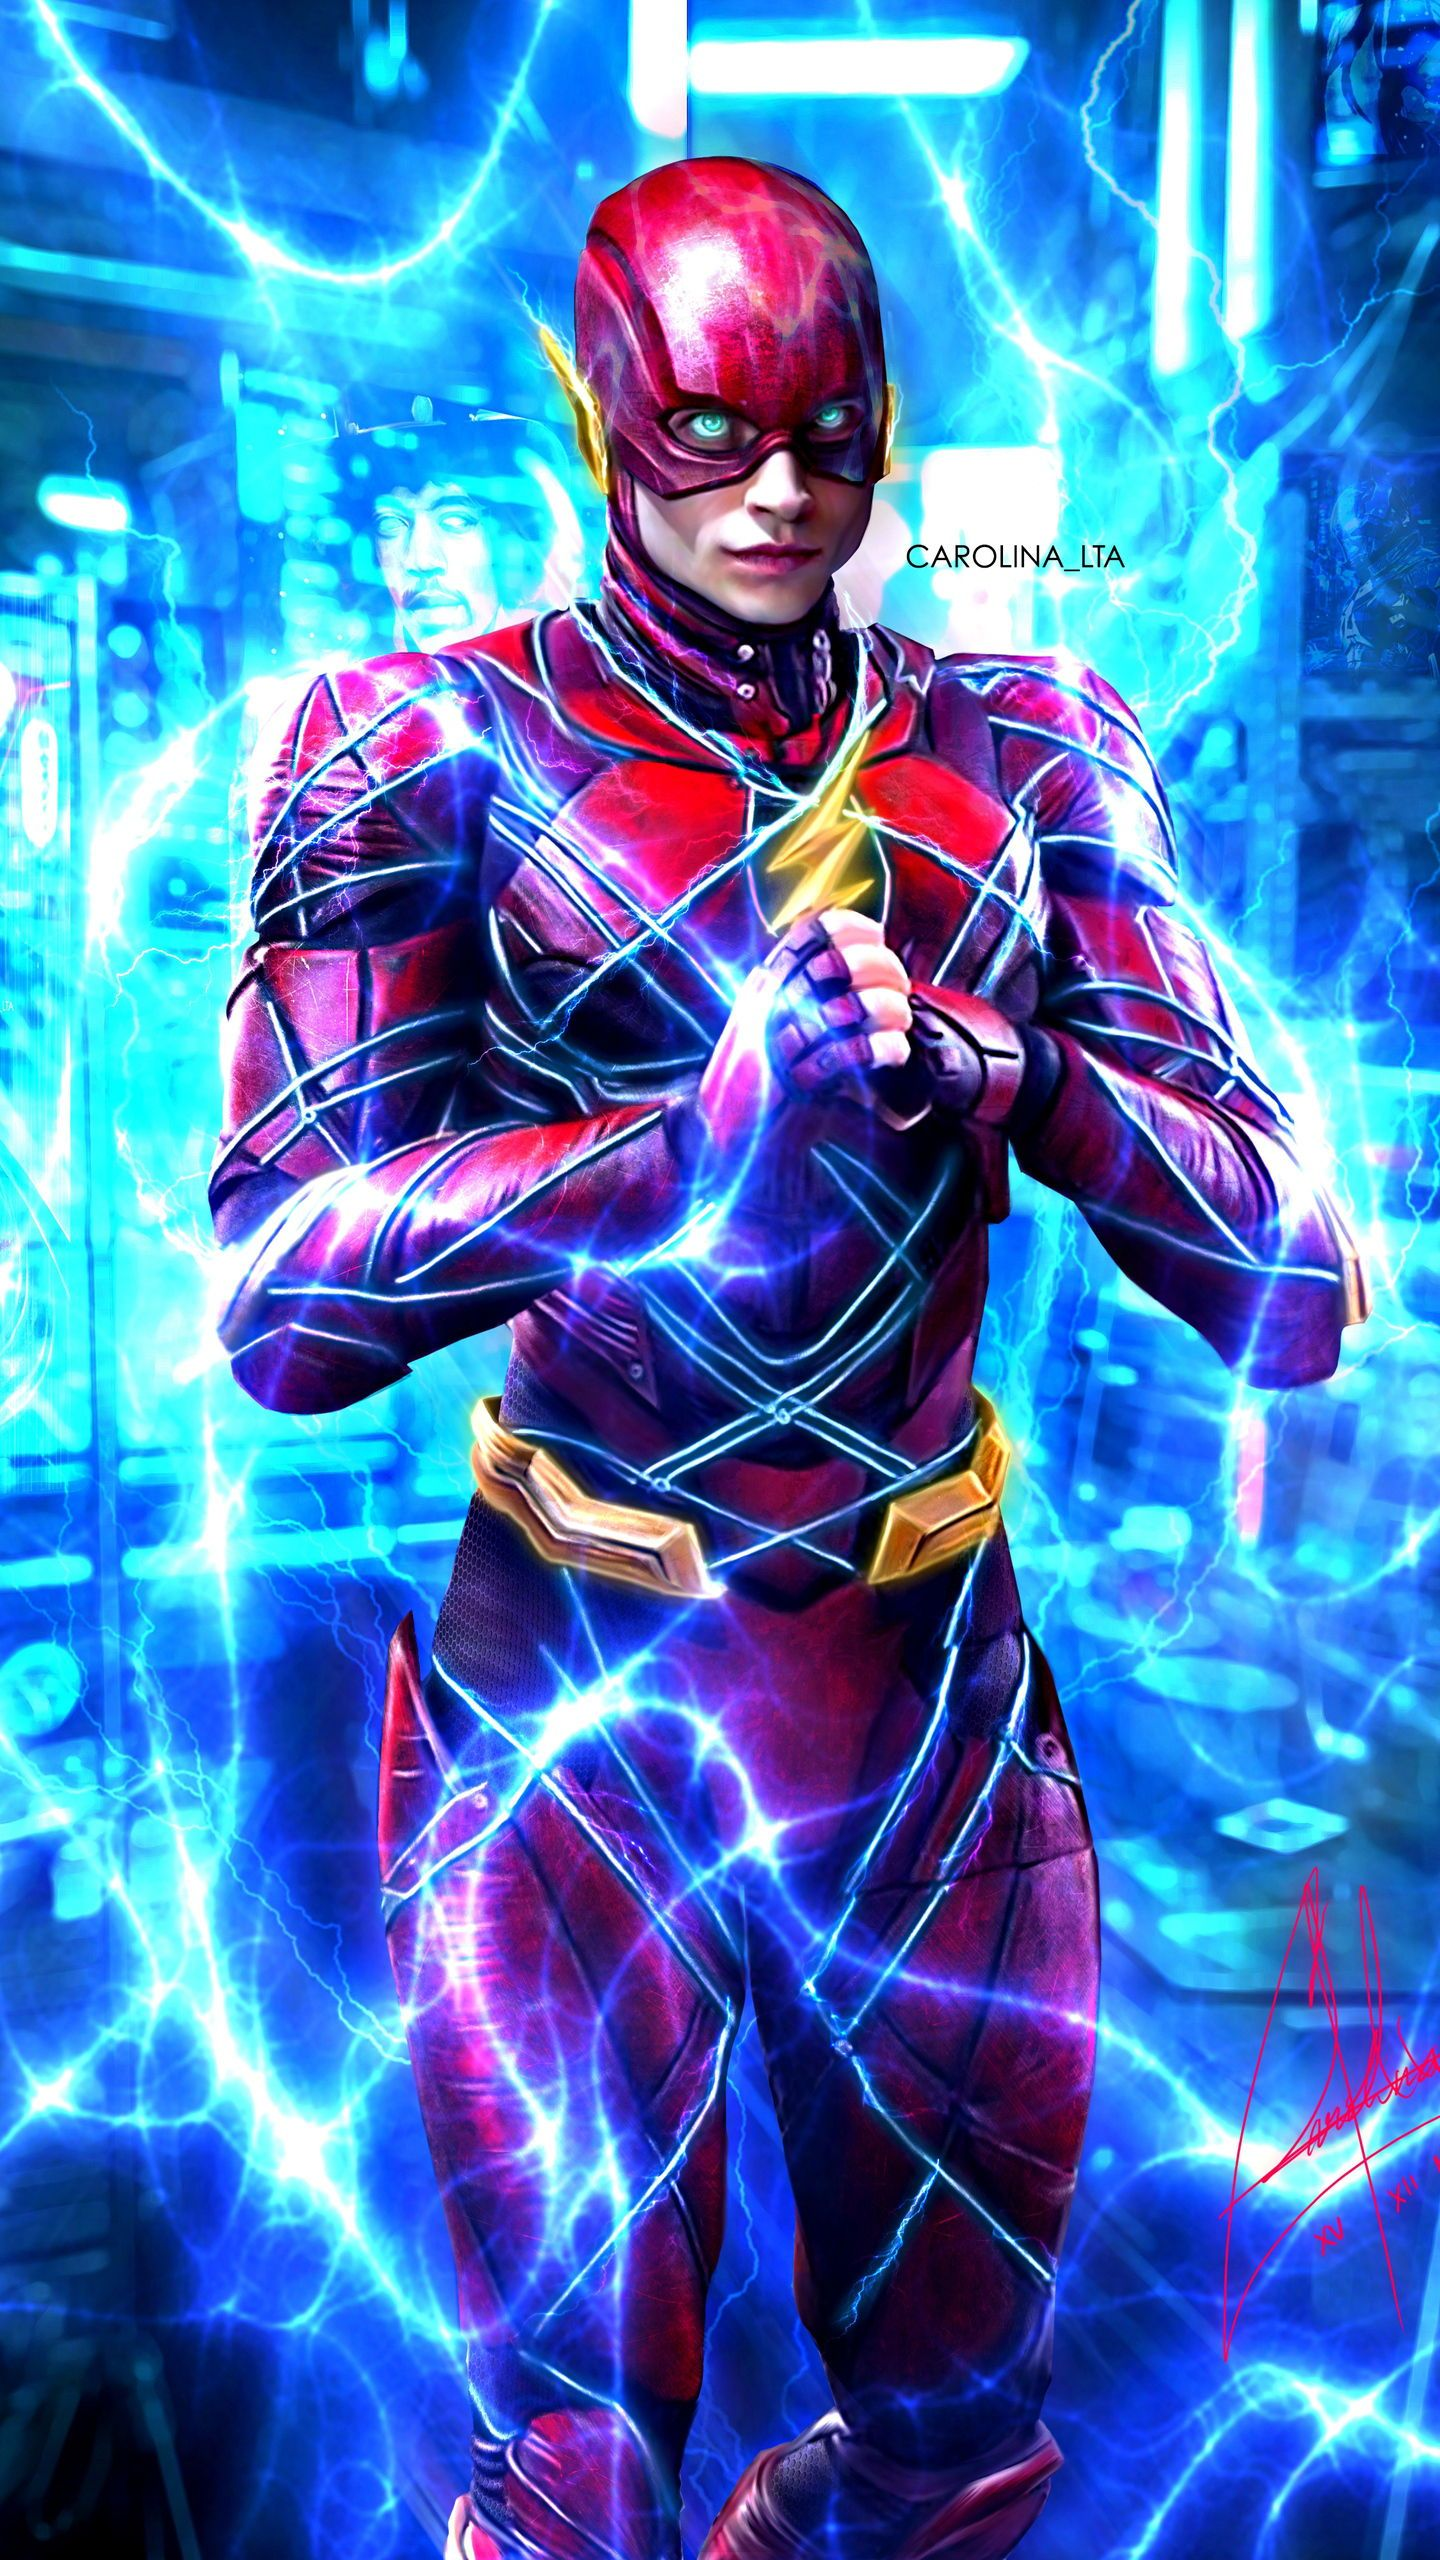 Download Hd Movie Wallpapers Fotos De Super Herois Flash Super Heroi Filmes De Herois